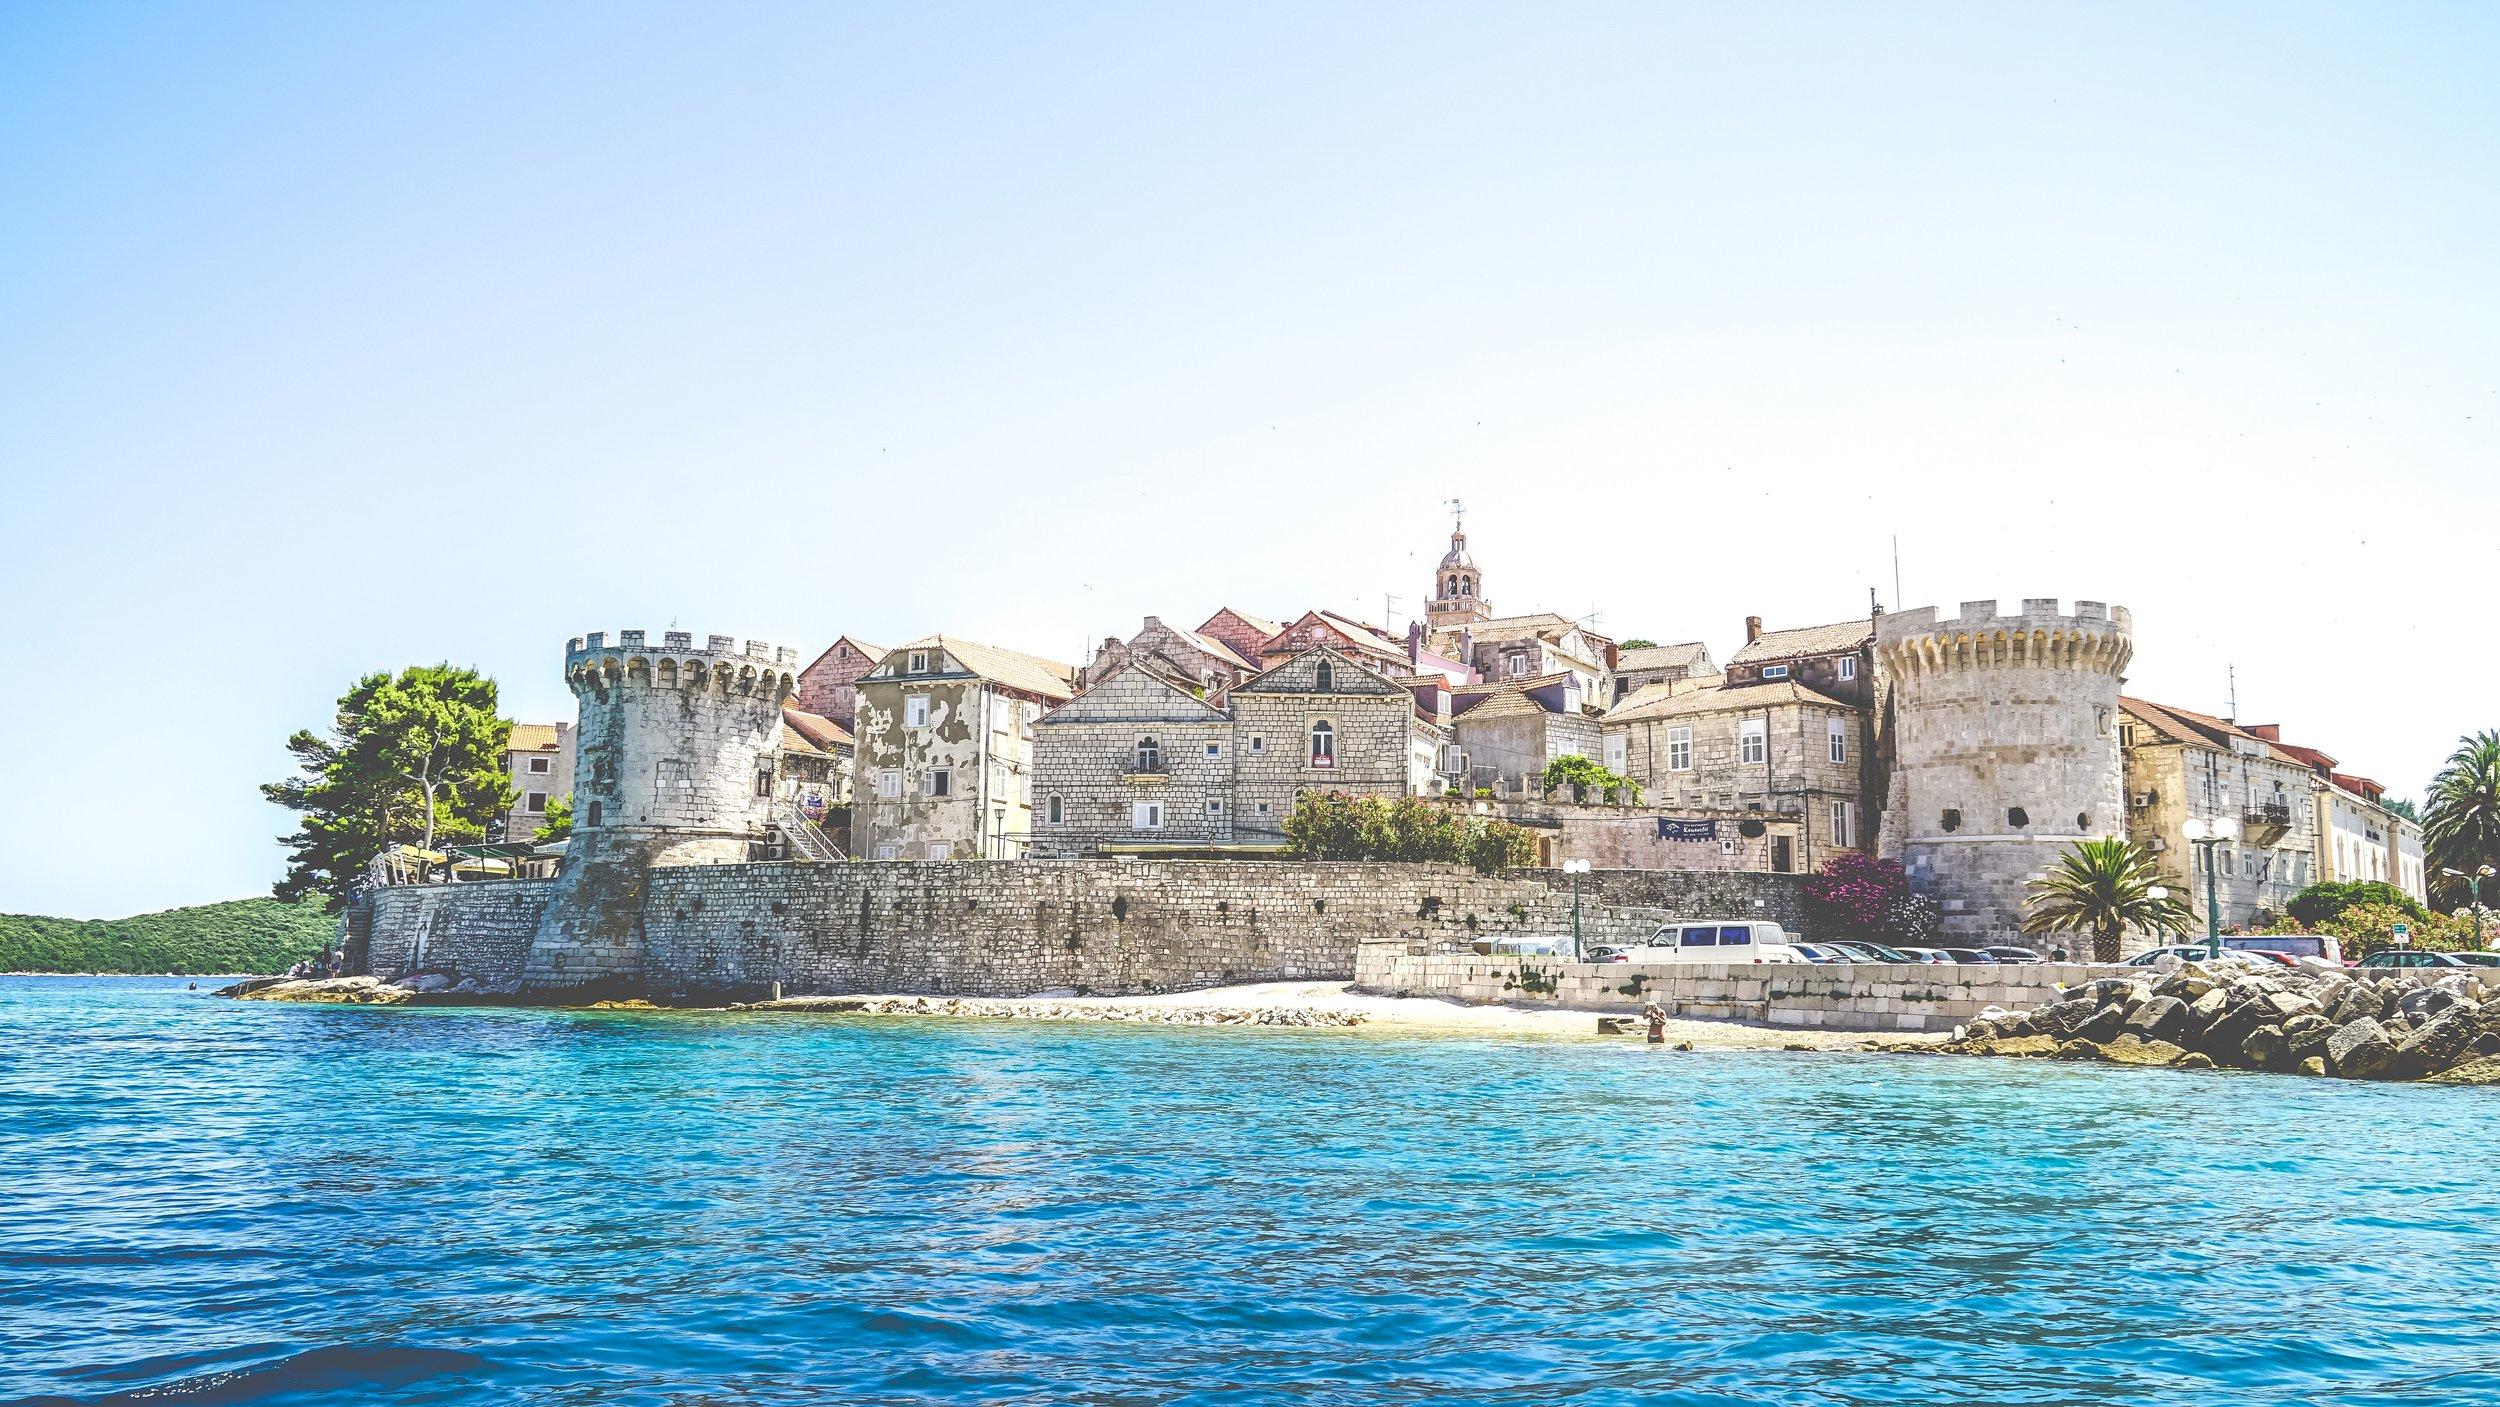 castle on the beach in croatia